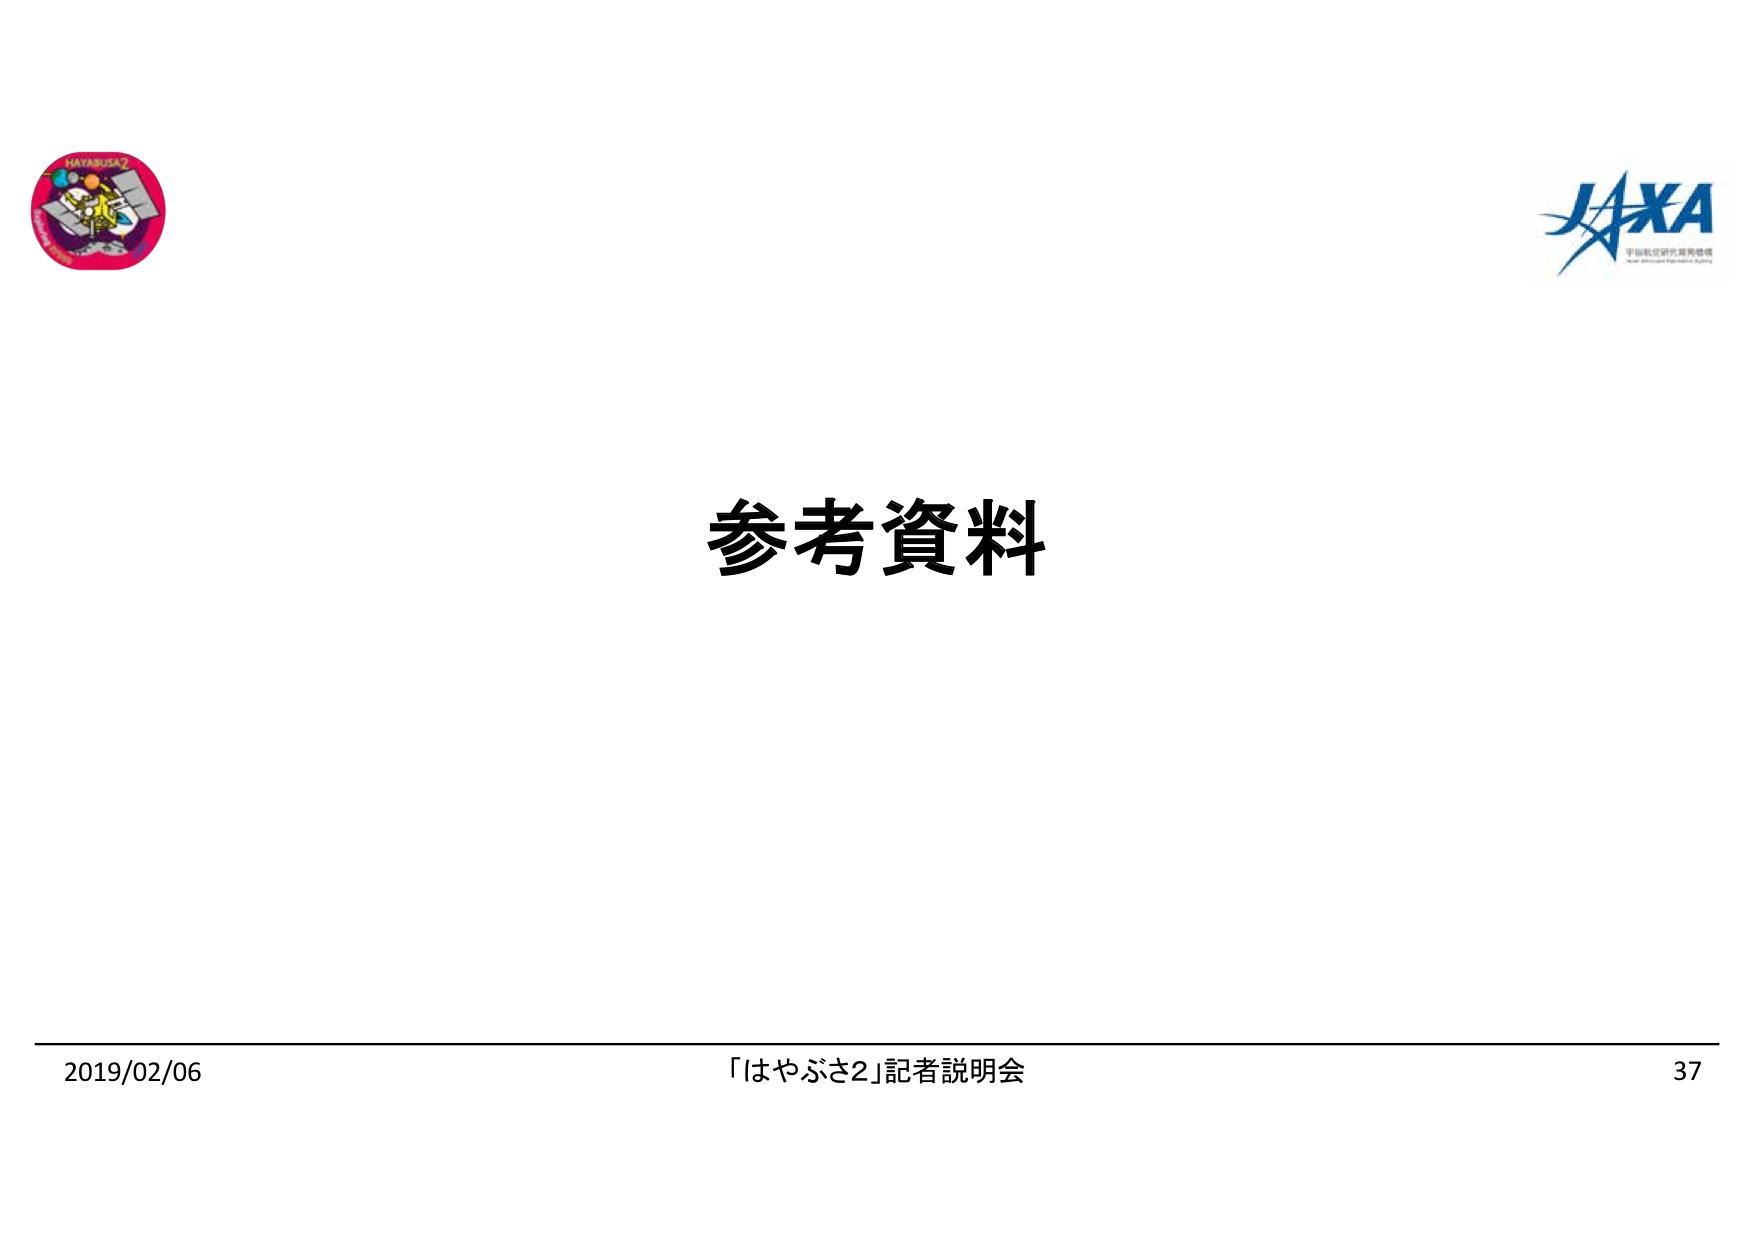 f:id:Imamura:20190204175531p:plain